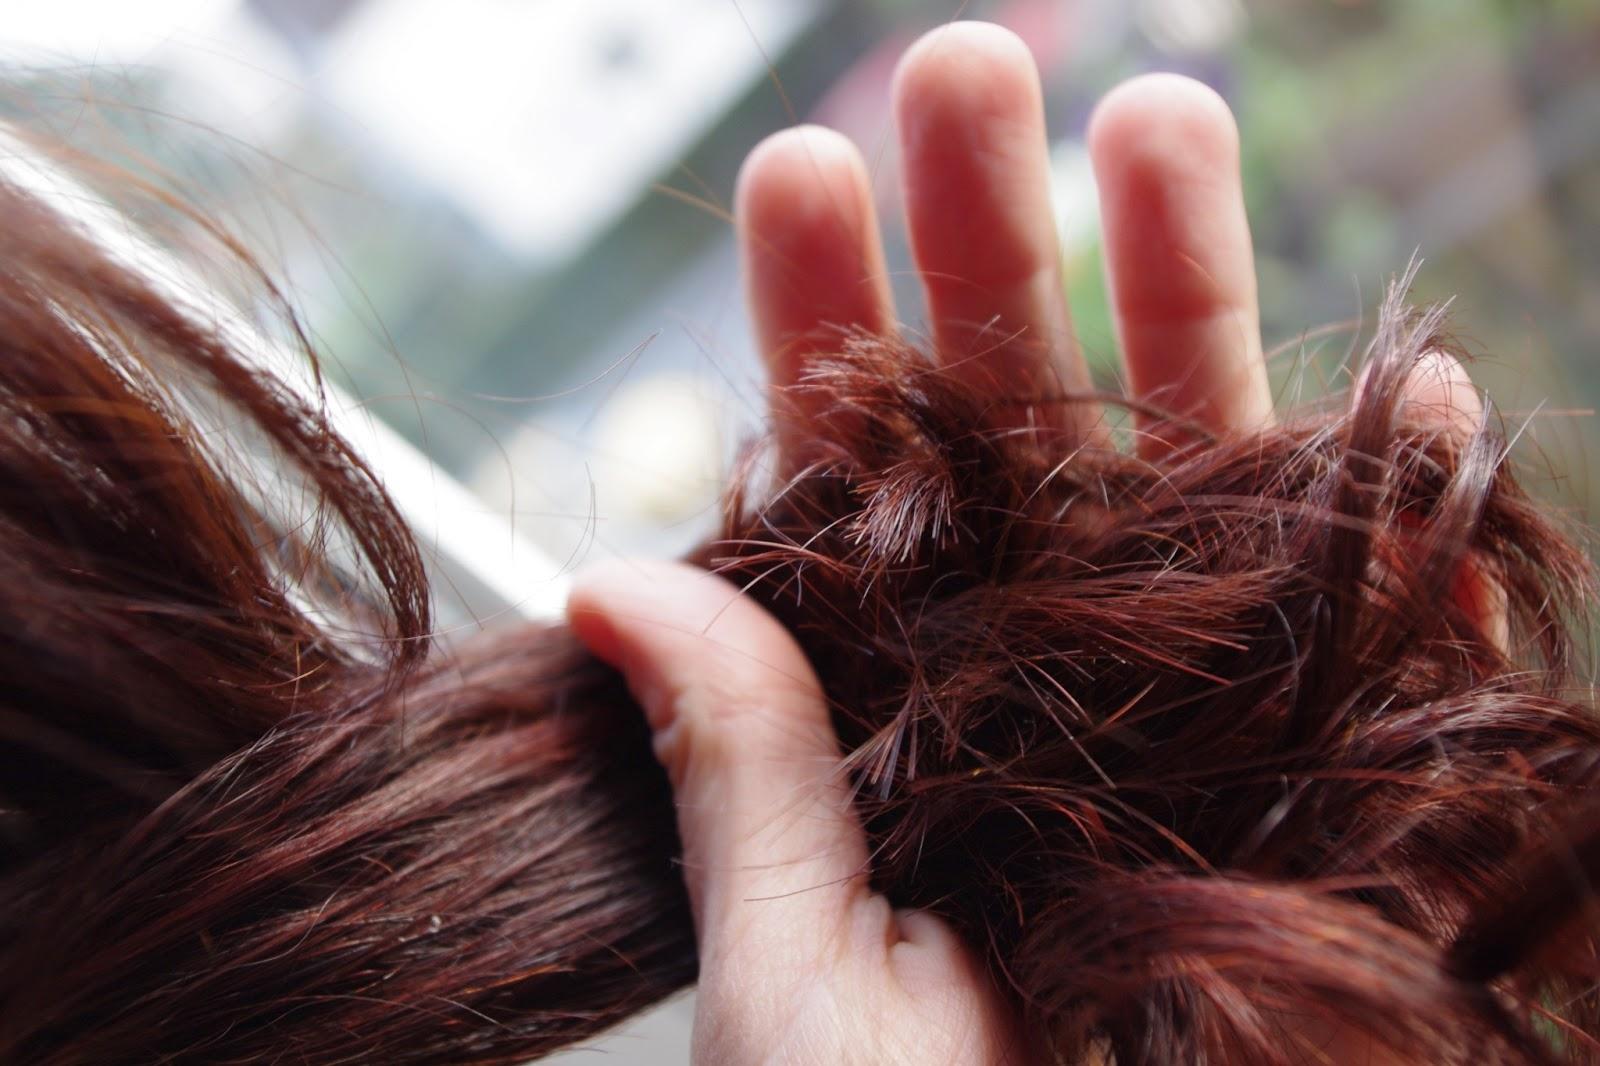 Hati Keseringan Menggunakan Cat Rambut Wanita Asal Cina Ini Henna Hobi Menyemir Di Salon Sejak 10 Tahun